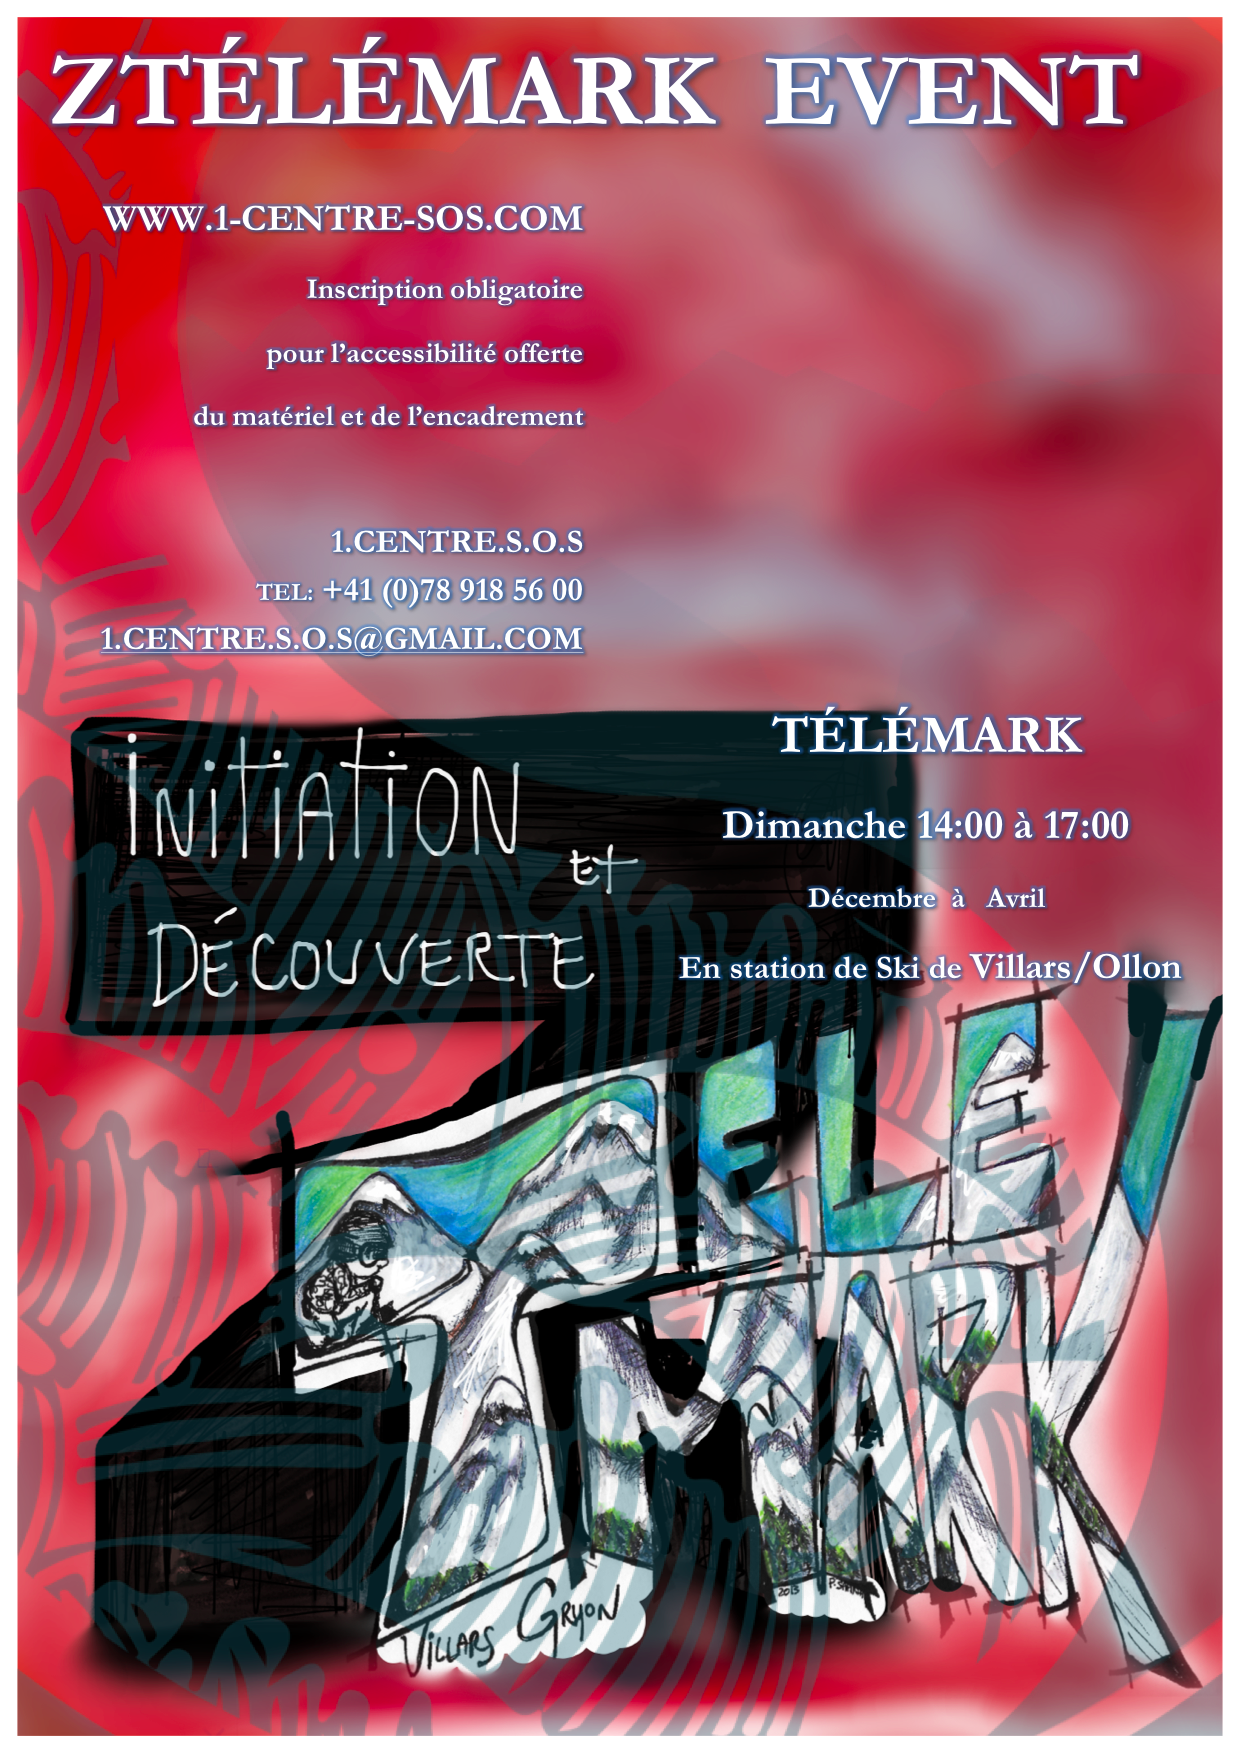 Z Telemark event 2019_edited